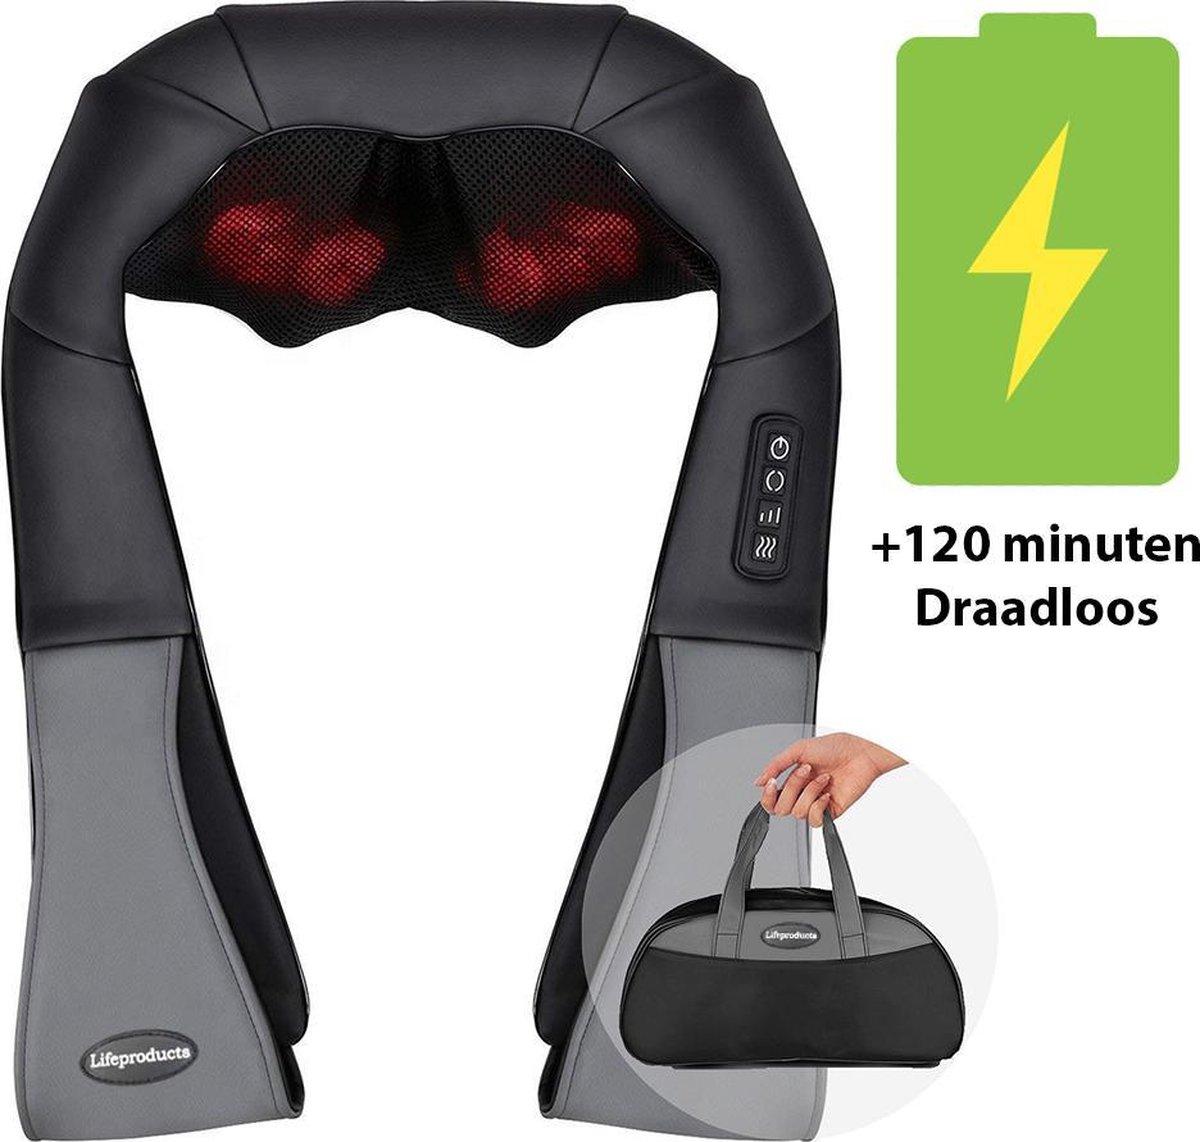 Lifeproducts - Draadloos Massagekussen - Shiatsu Massage